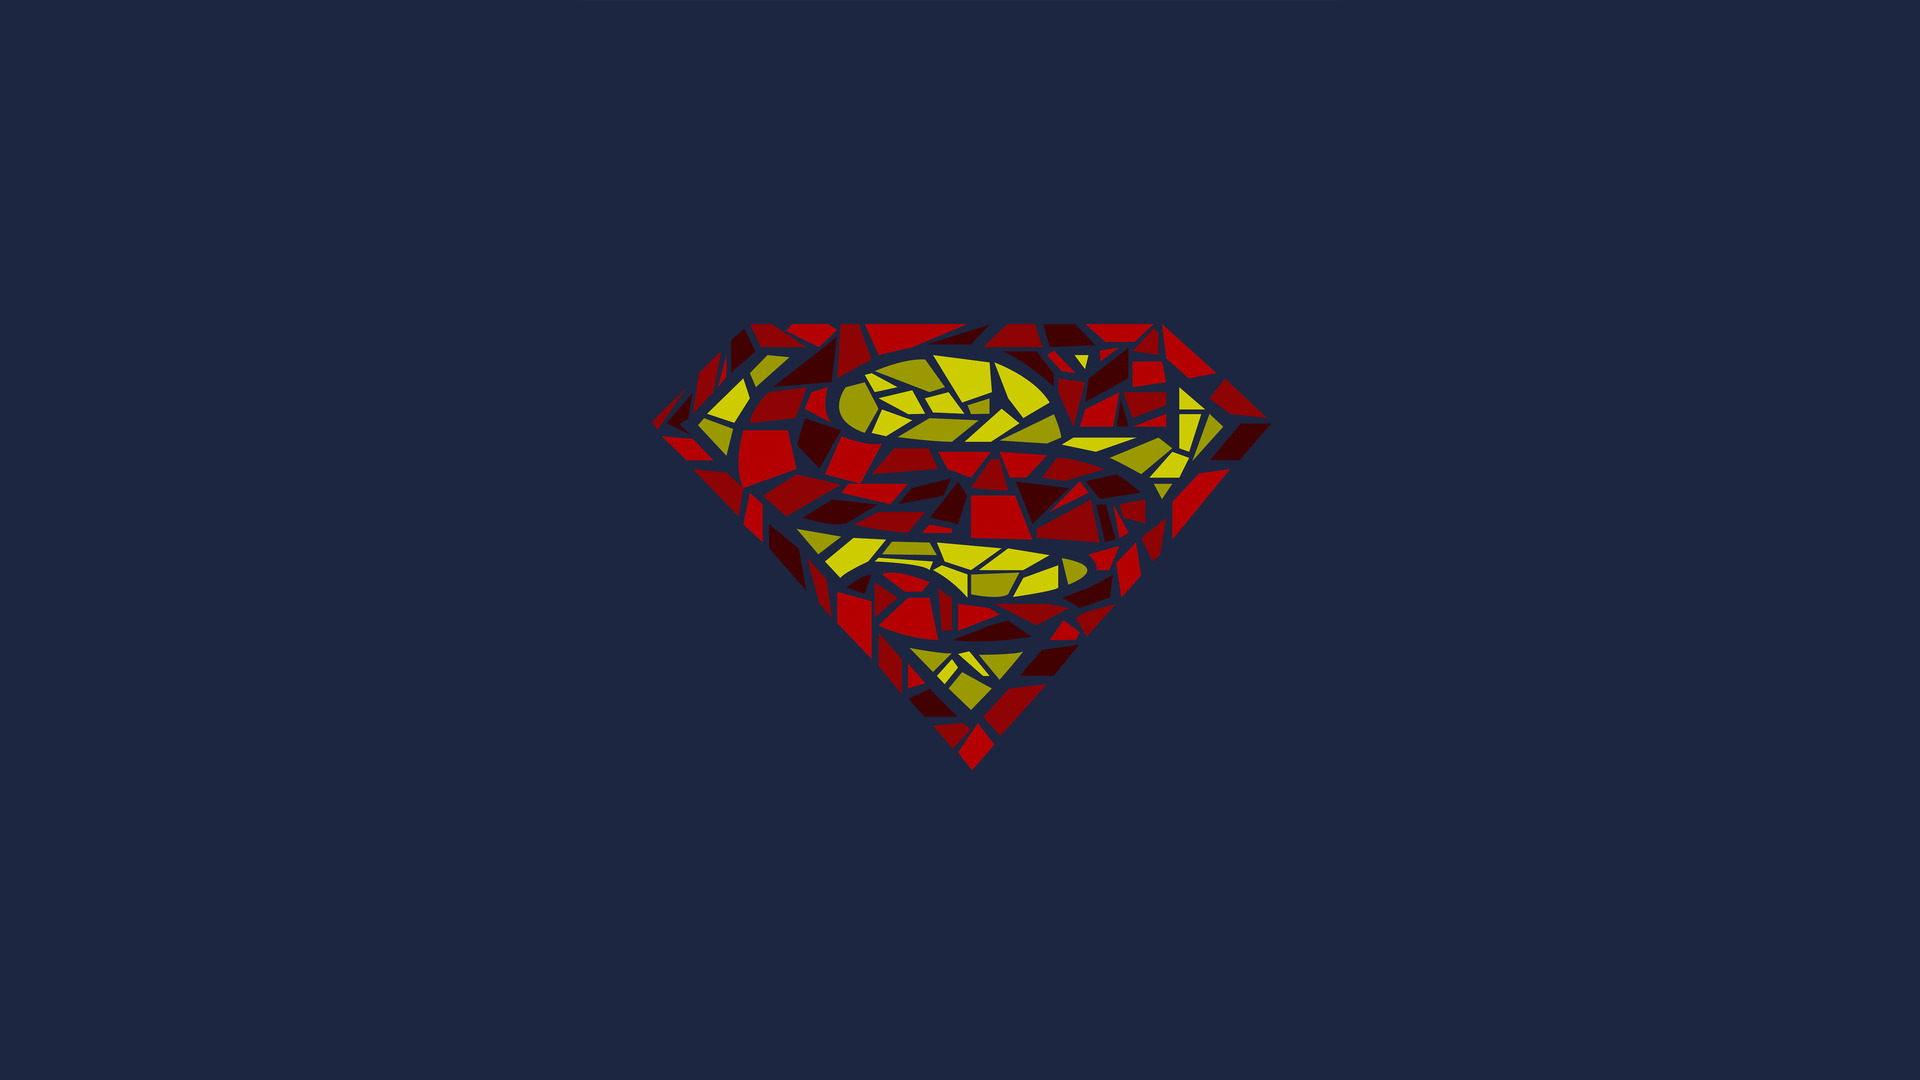 1920x1080 superman logo artwork laptop full hd 1080p hd 4k superman logo artwork 44g voltagebd Gallery